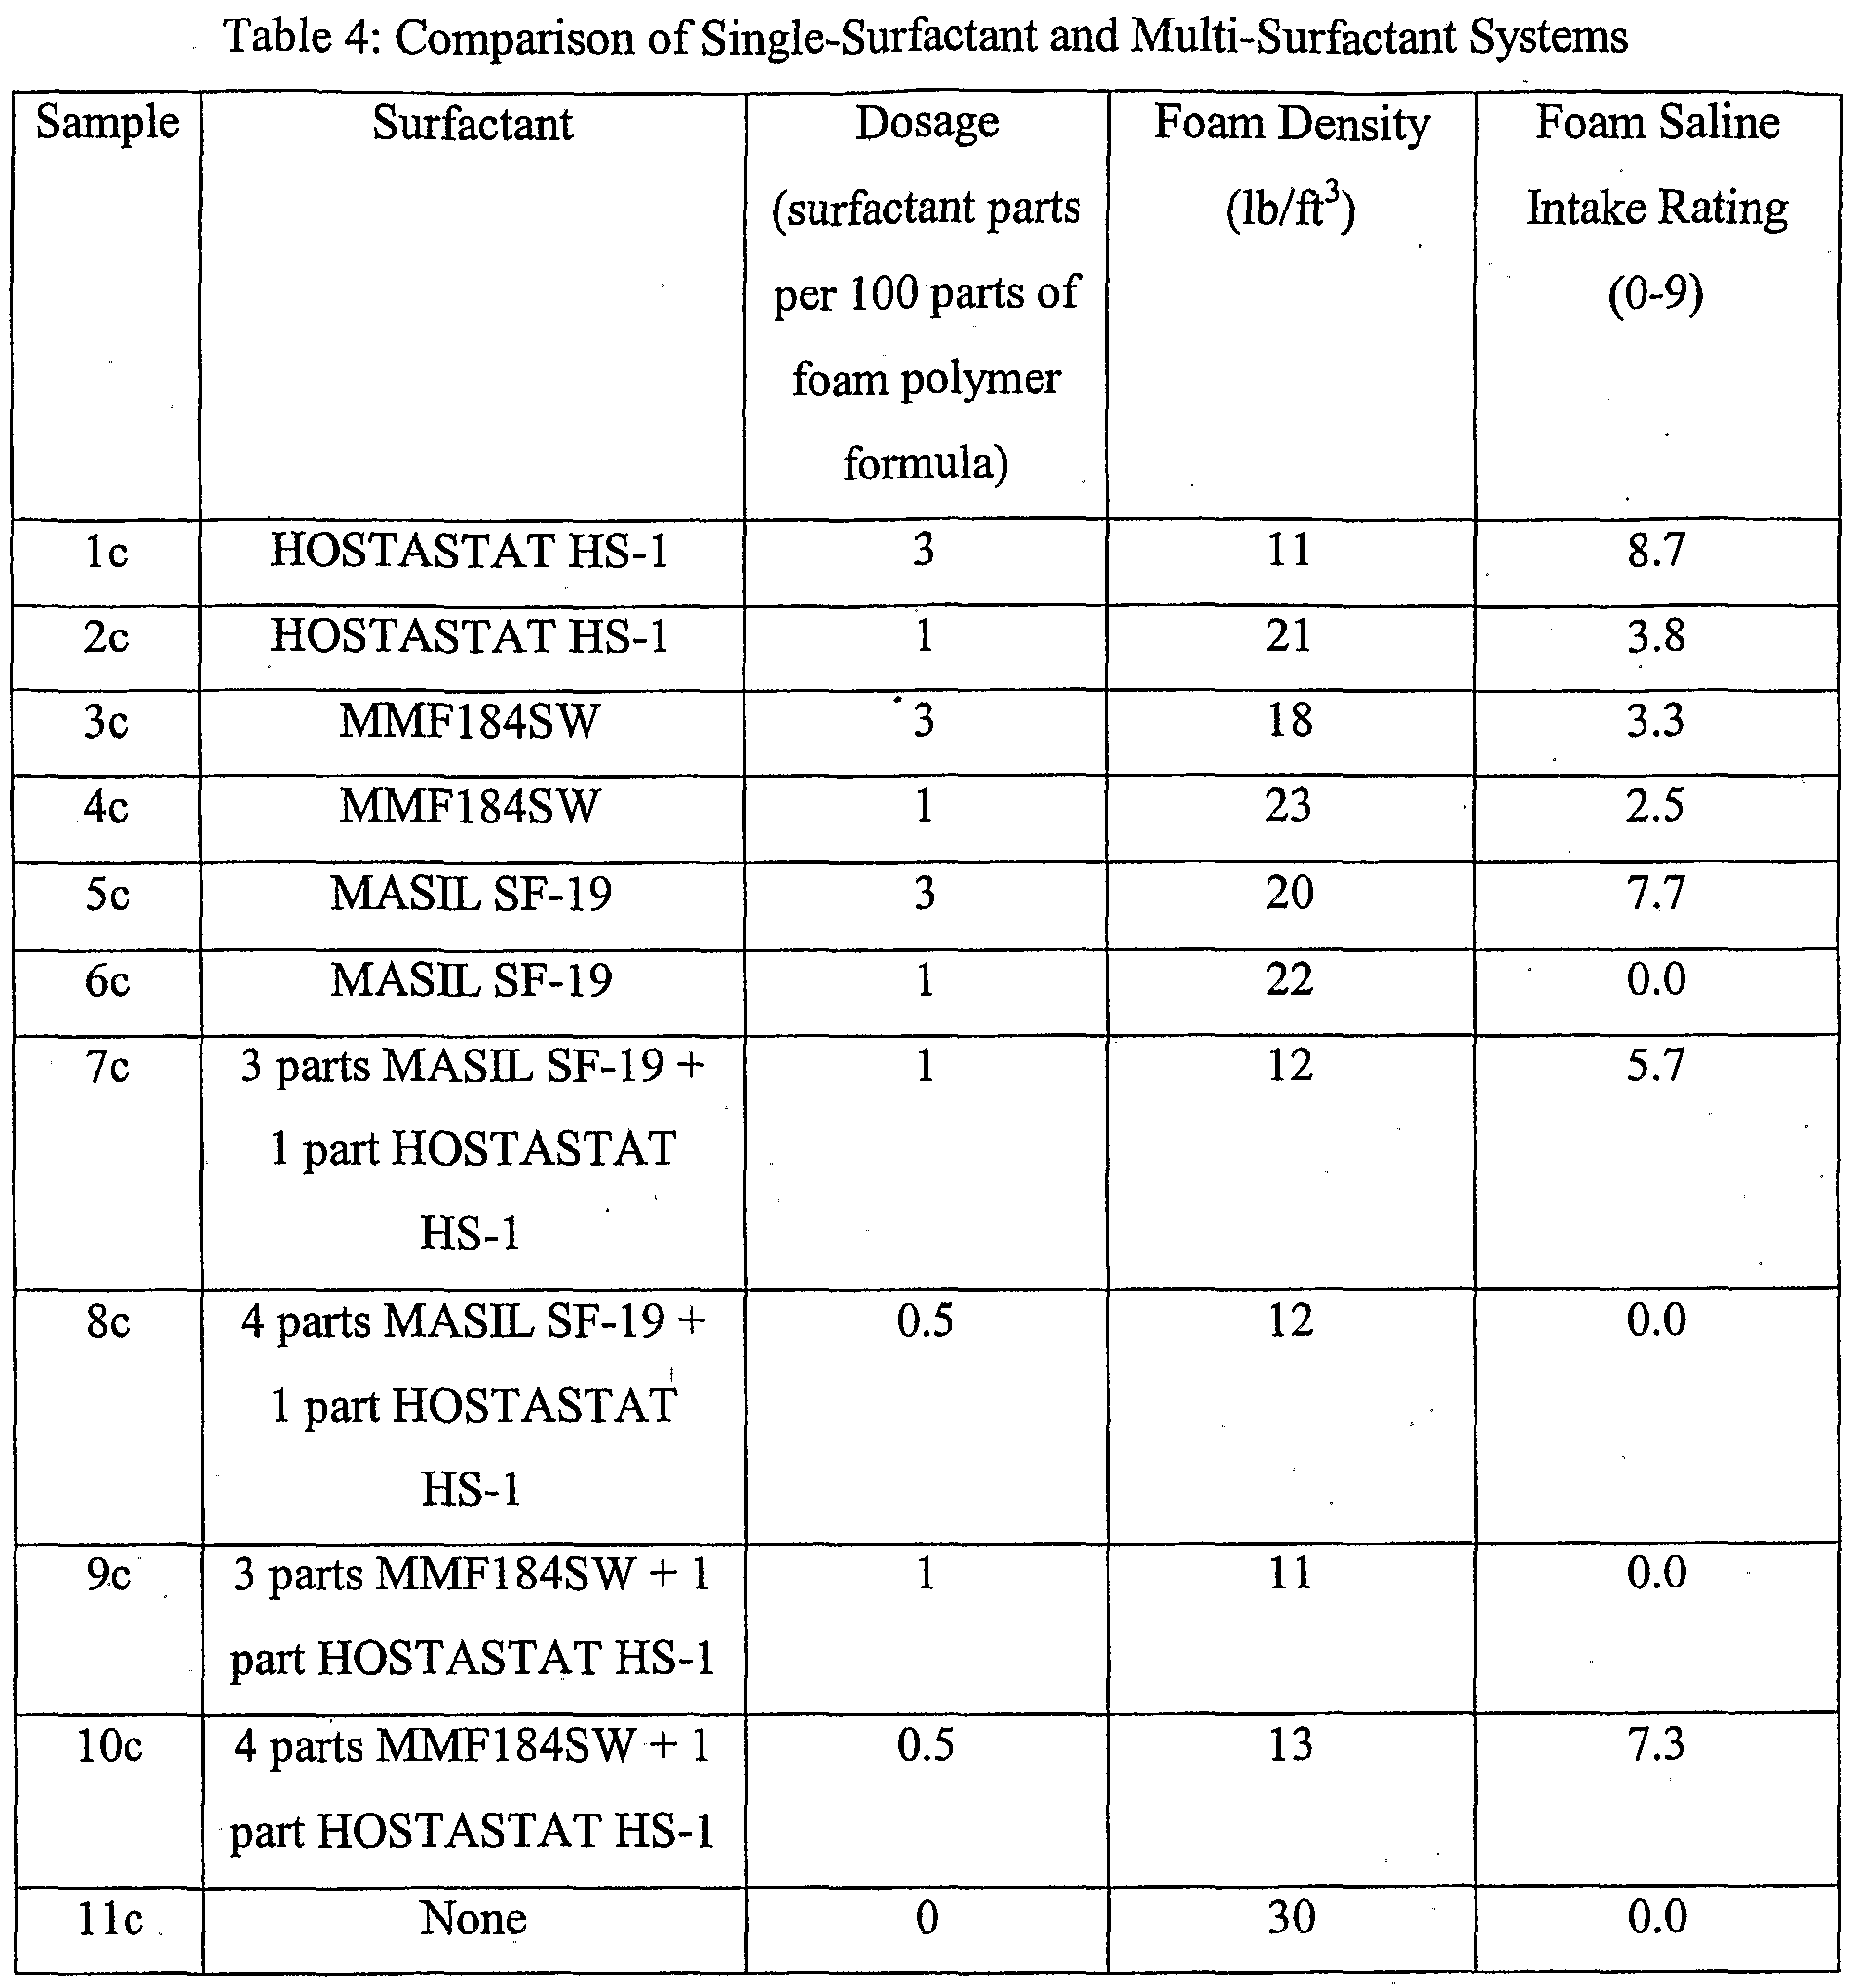 WO2005061600A1 - Low-density, open-cell, soft, flexible